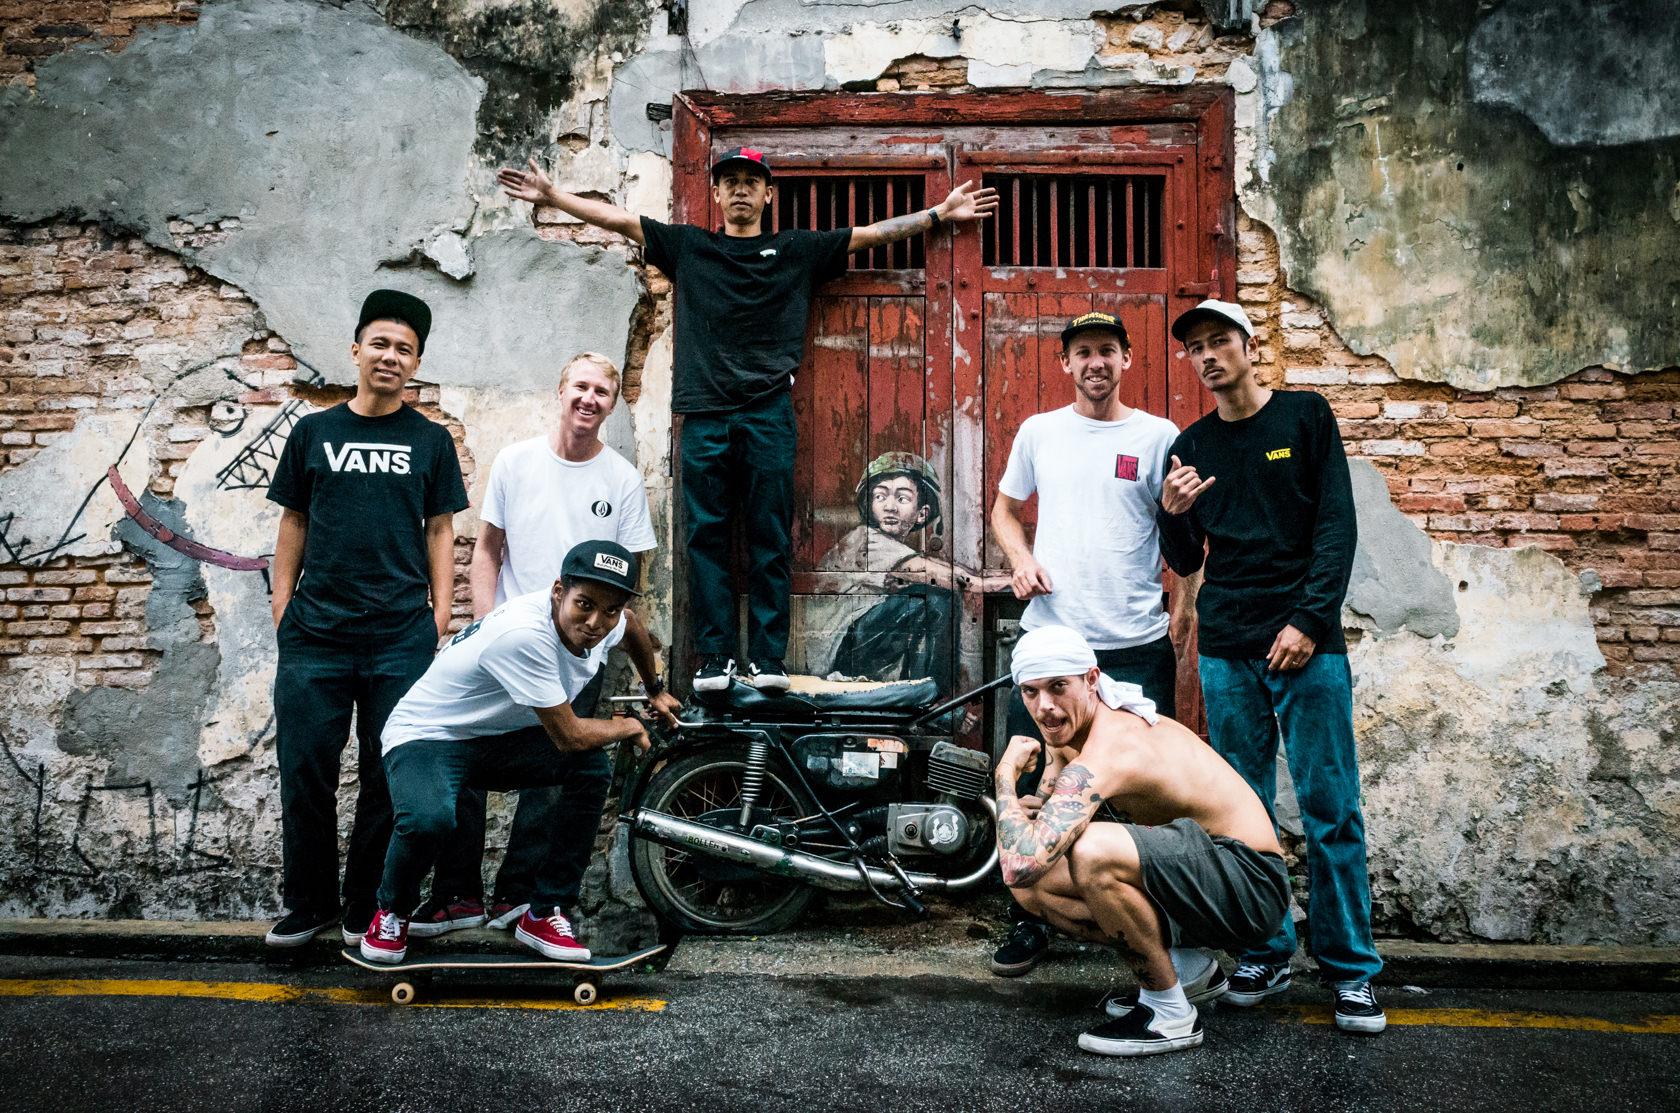 VANS_GR新加坡&马来西亚TOUR030171128-2.jpg